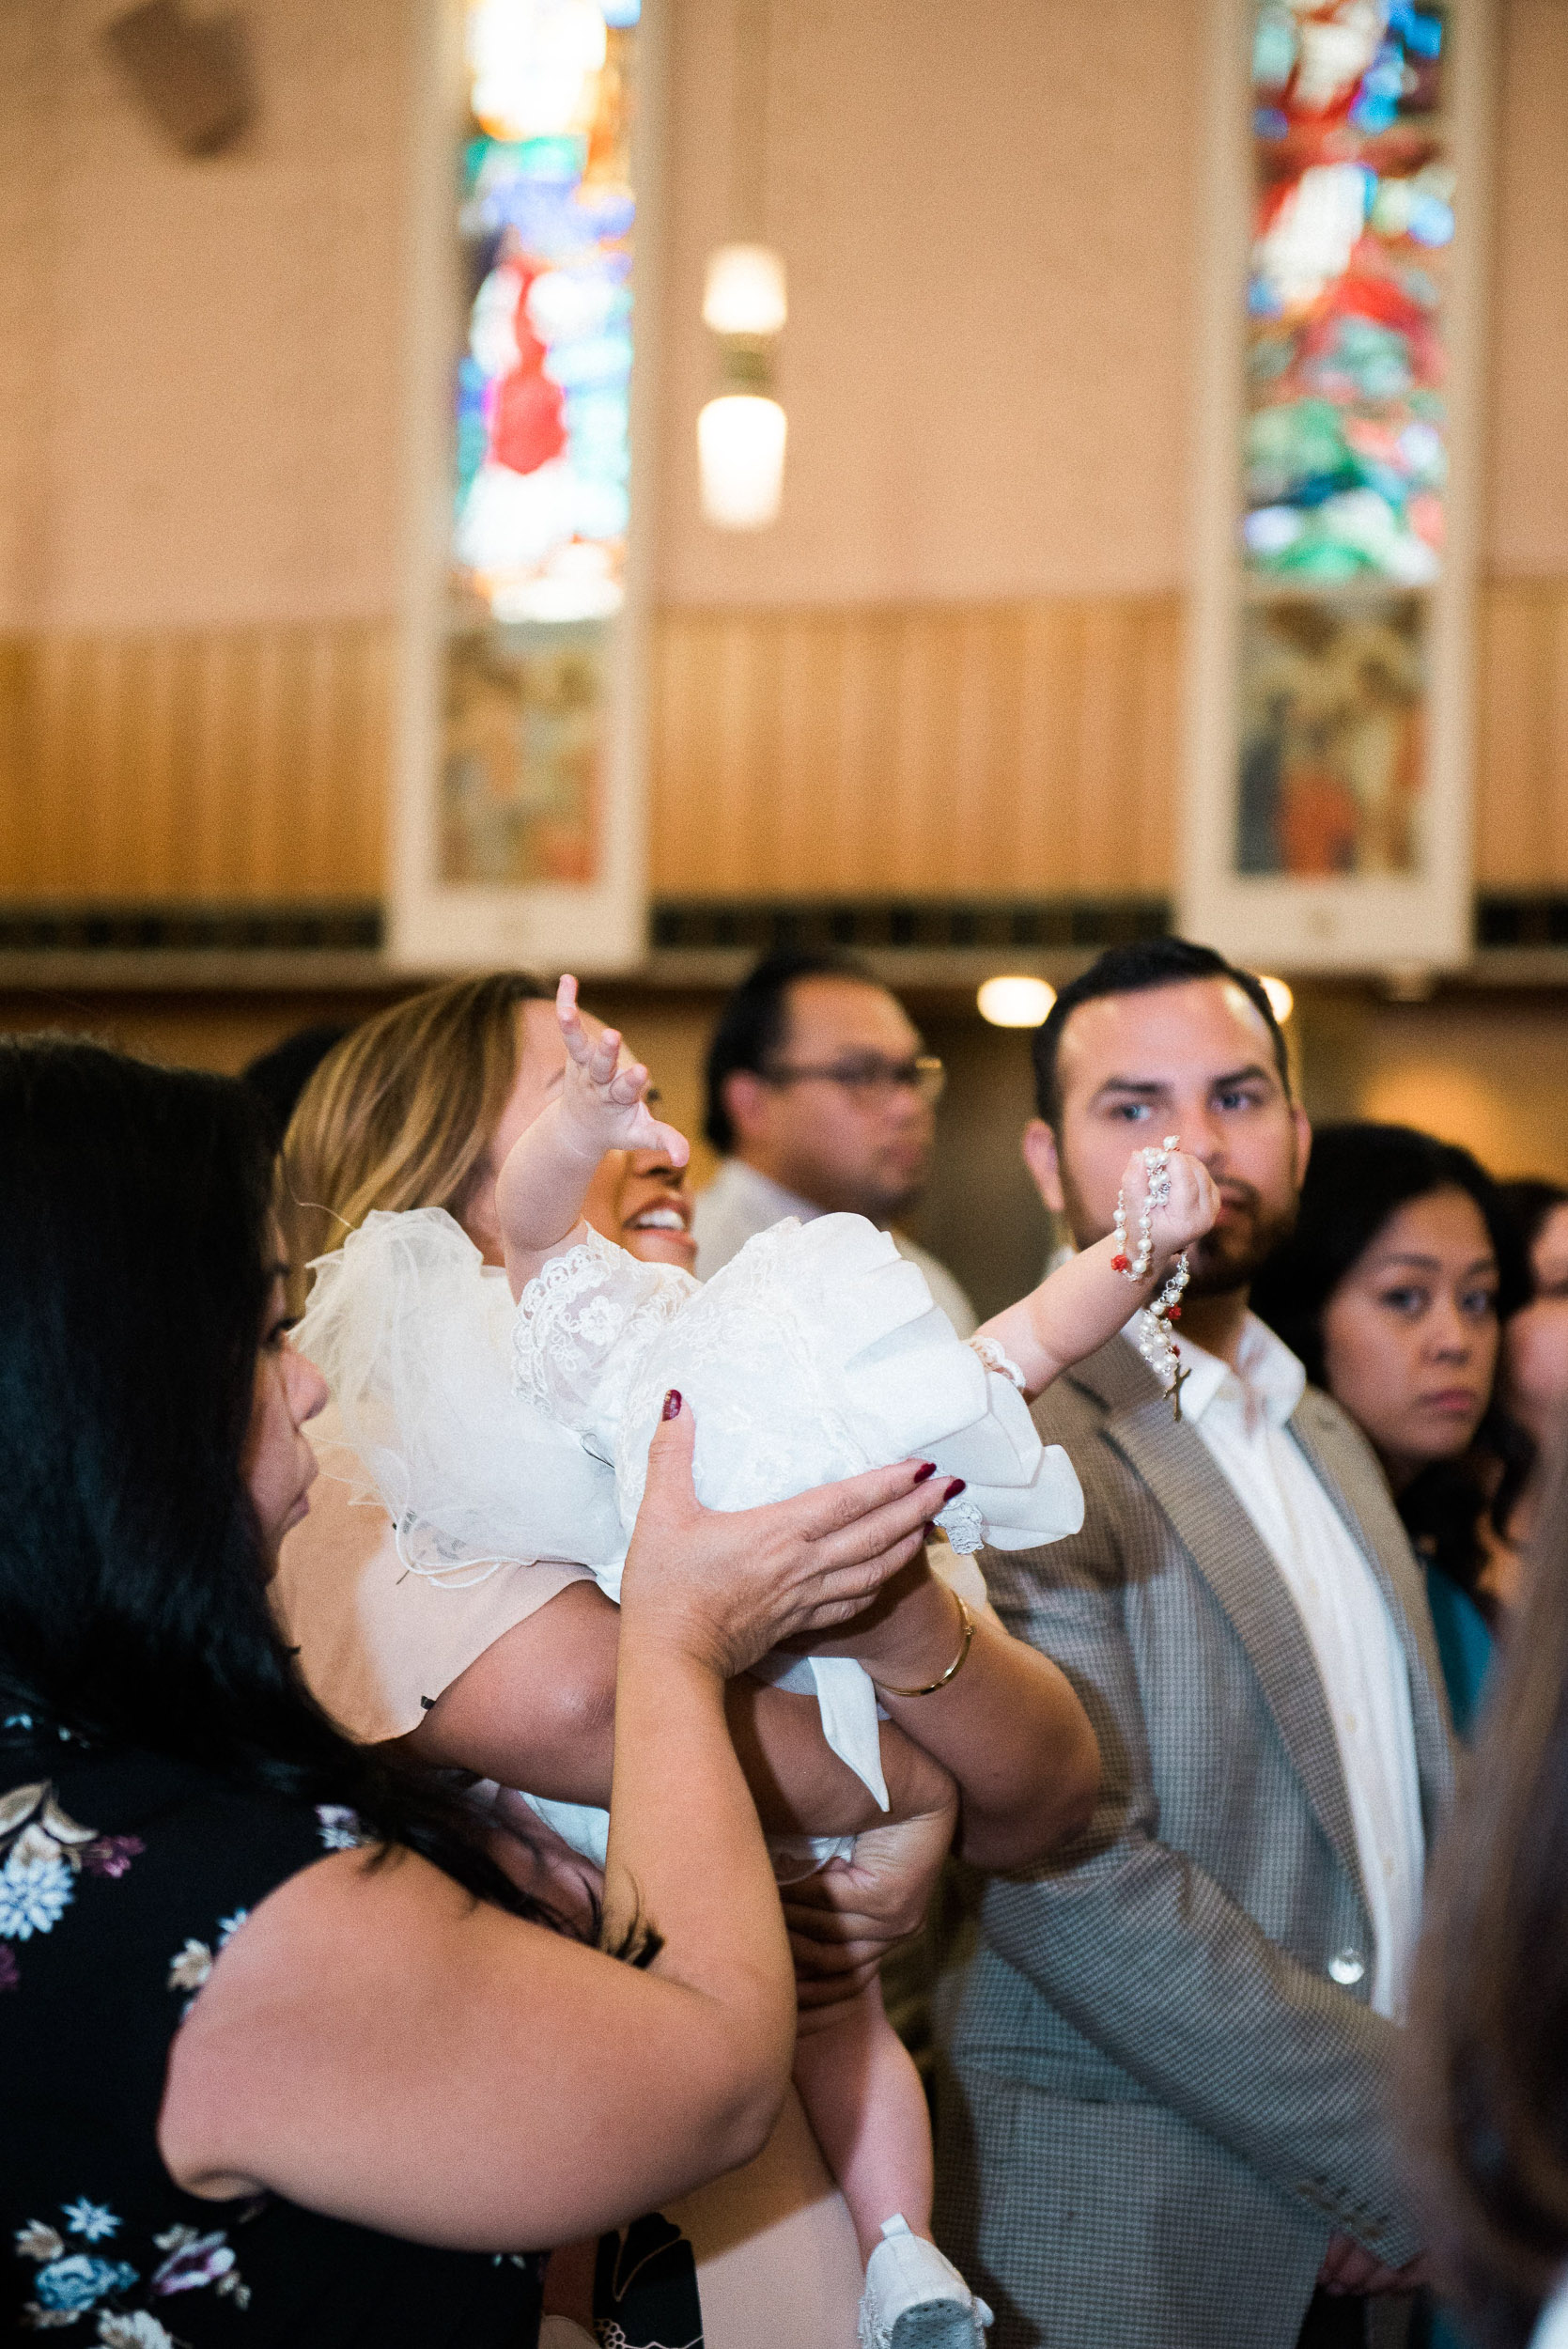 Bryan-Miraflor-Photo-Allison-Baptism-Church-20171014-0171.jpg